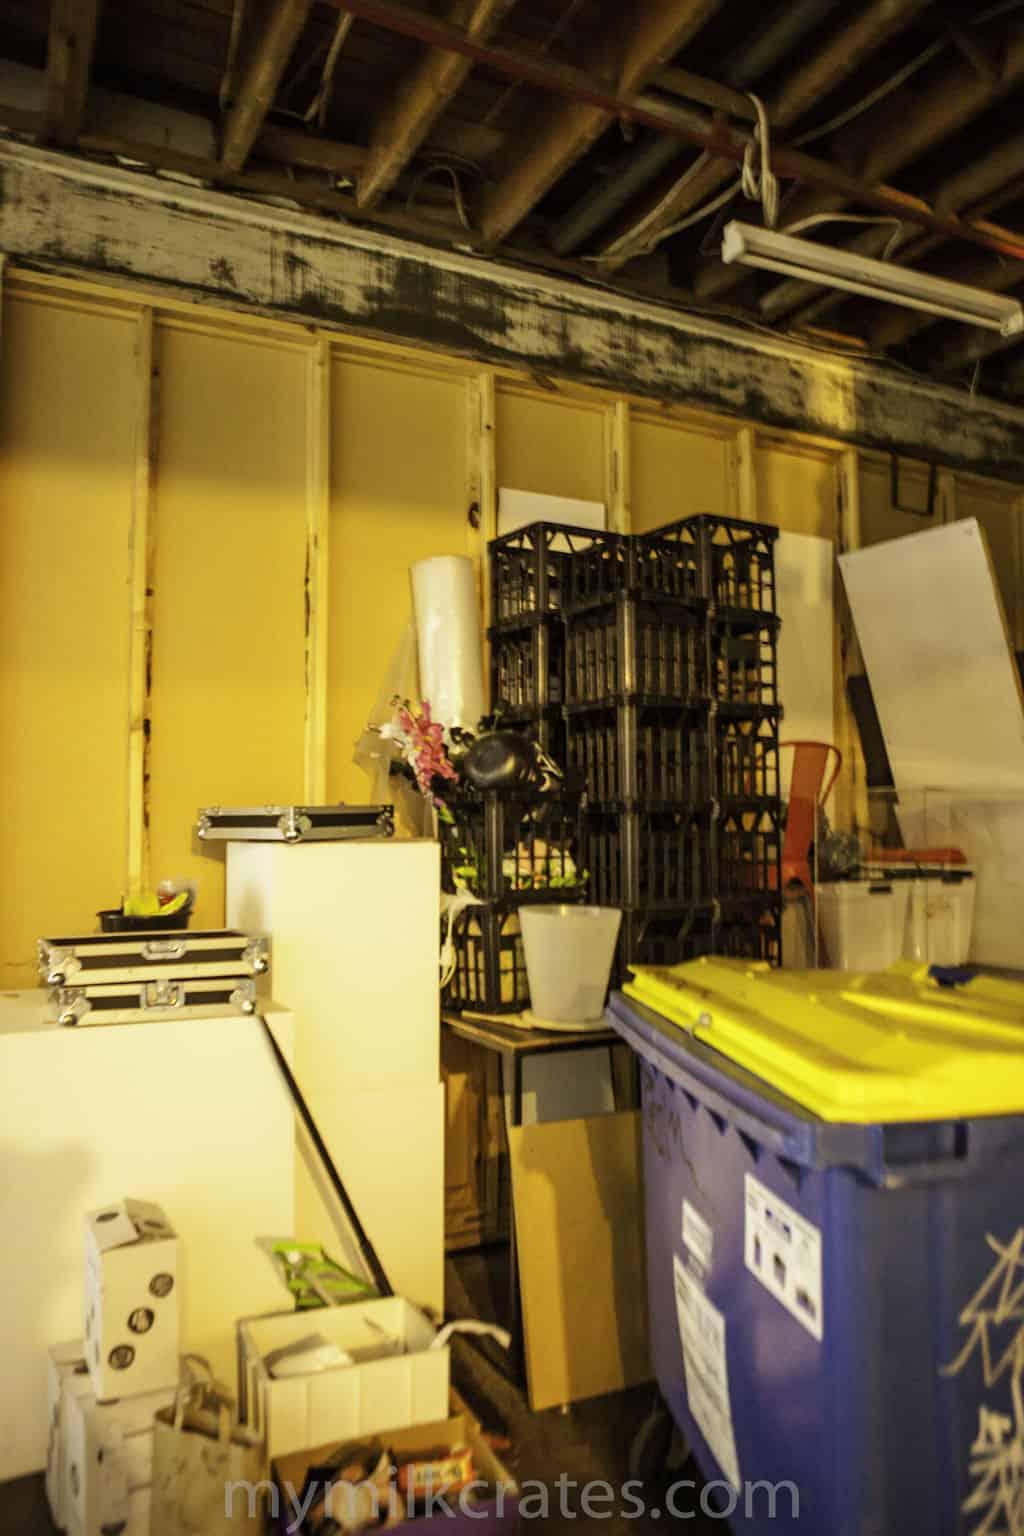 Back room crates